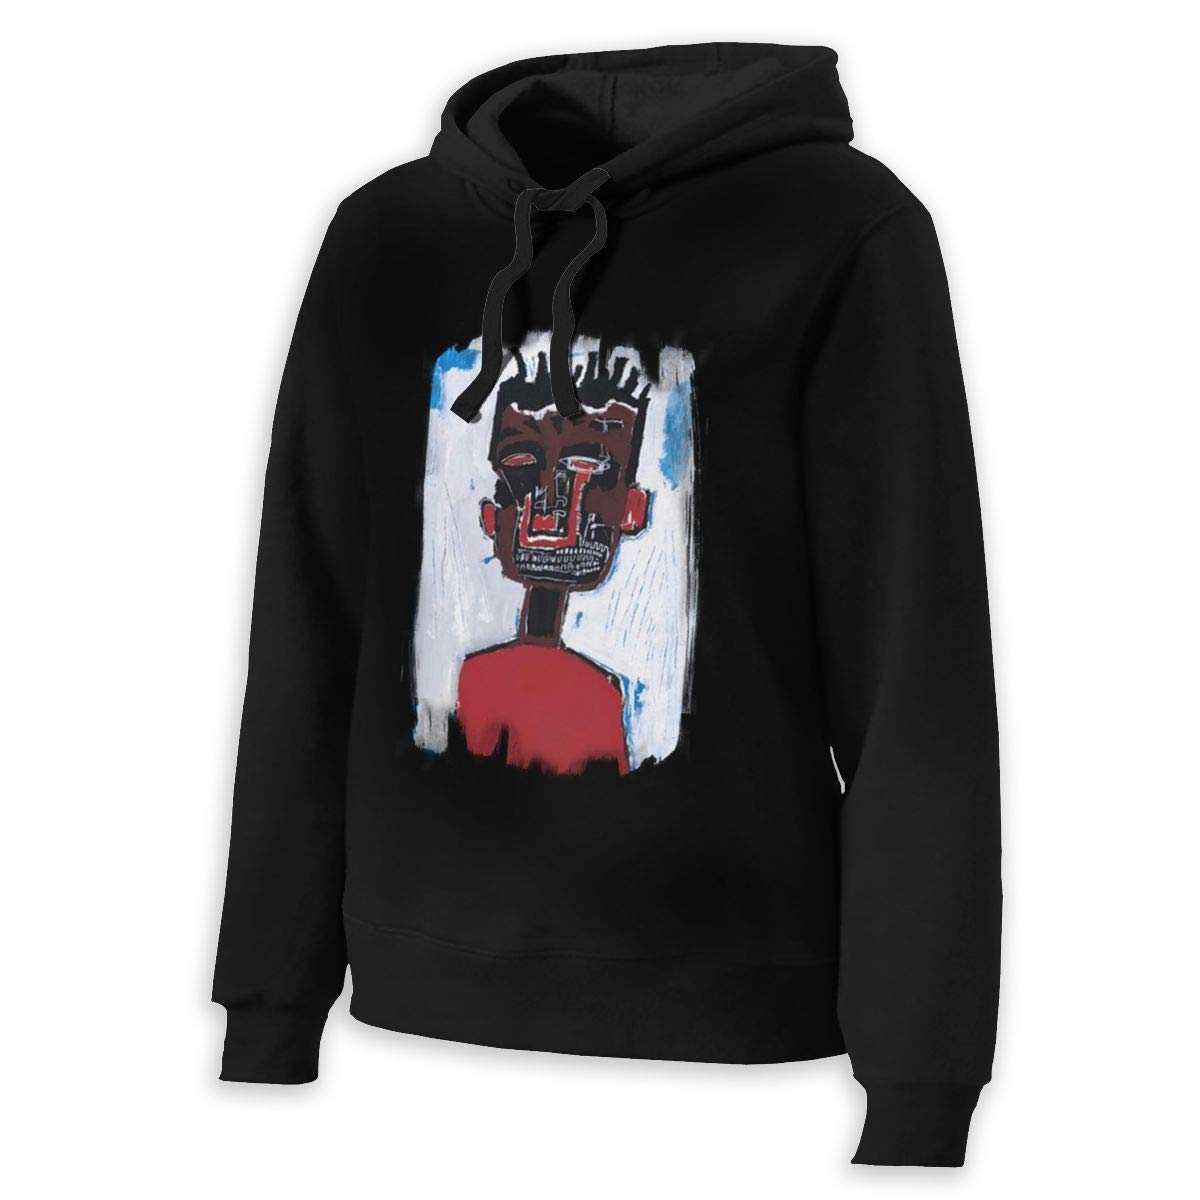 PZY L KING Womans Jean Michel Basquiat Hoodie